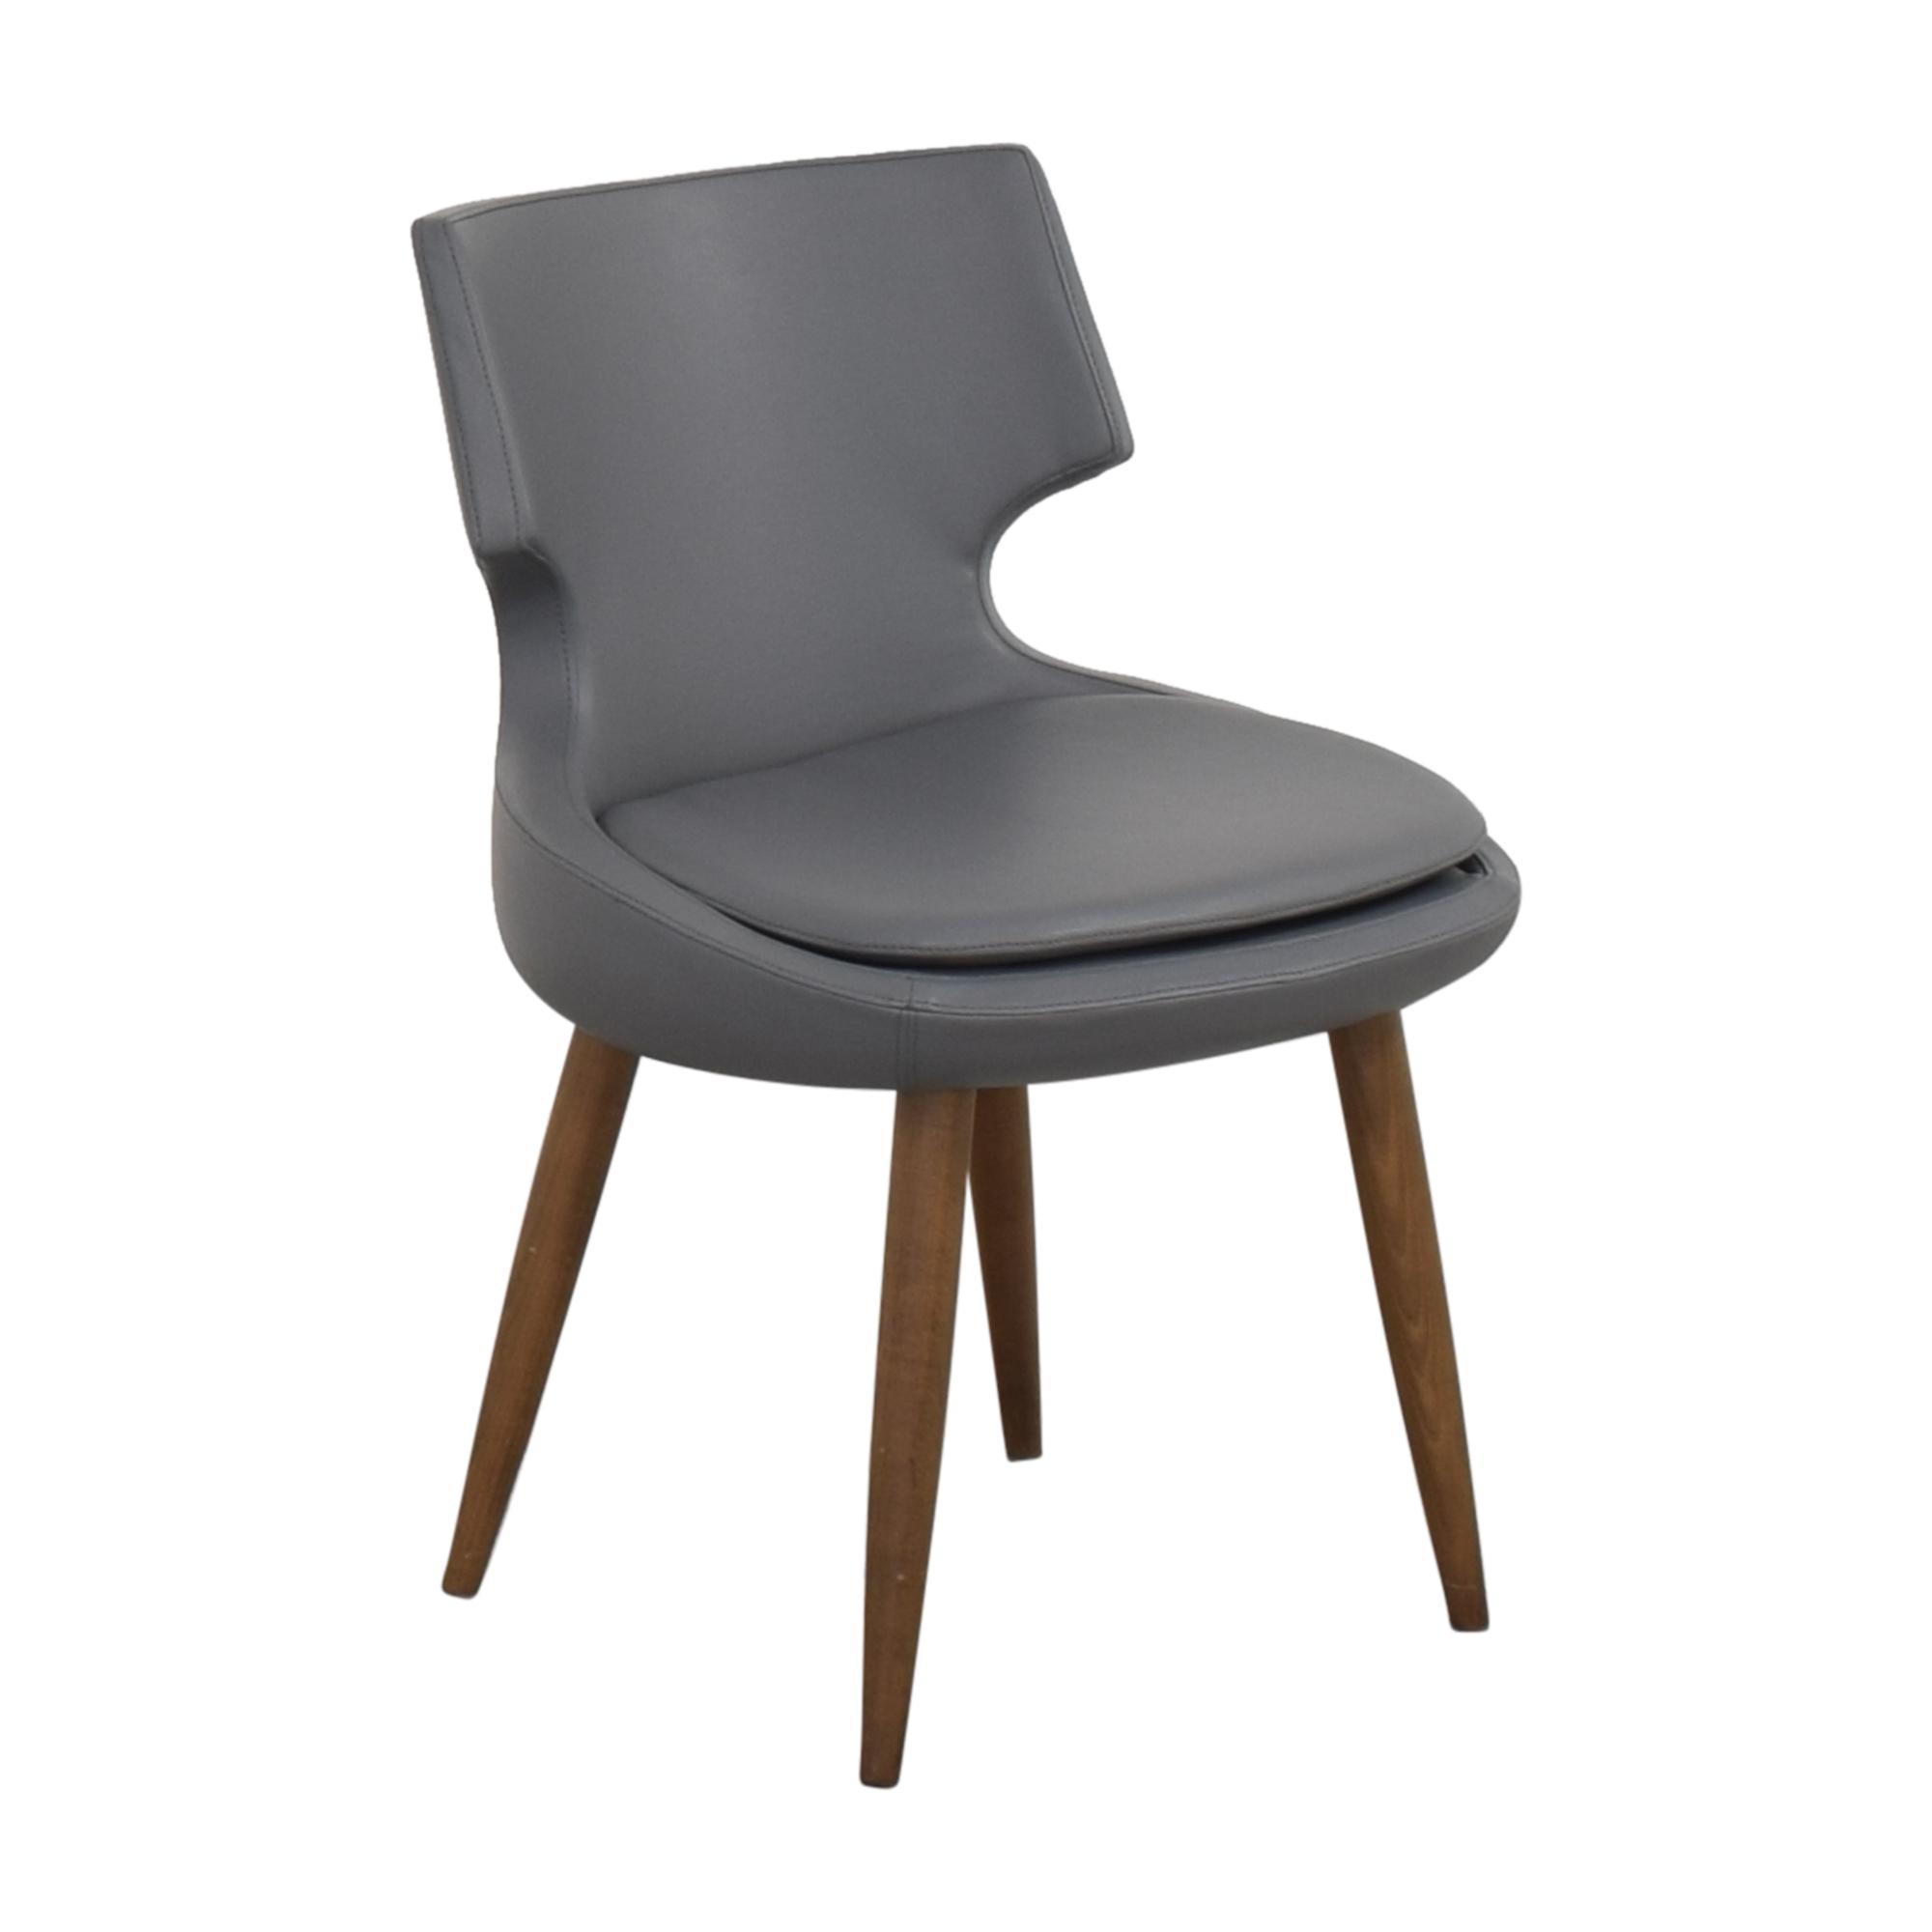 shop sohoConcept Patara Dining Chair sohoConcept Chairs